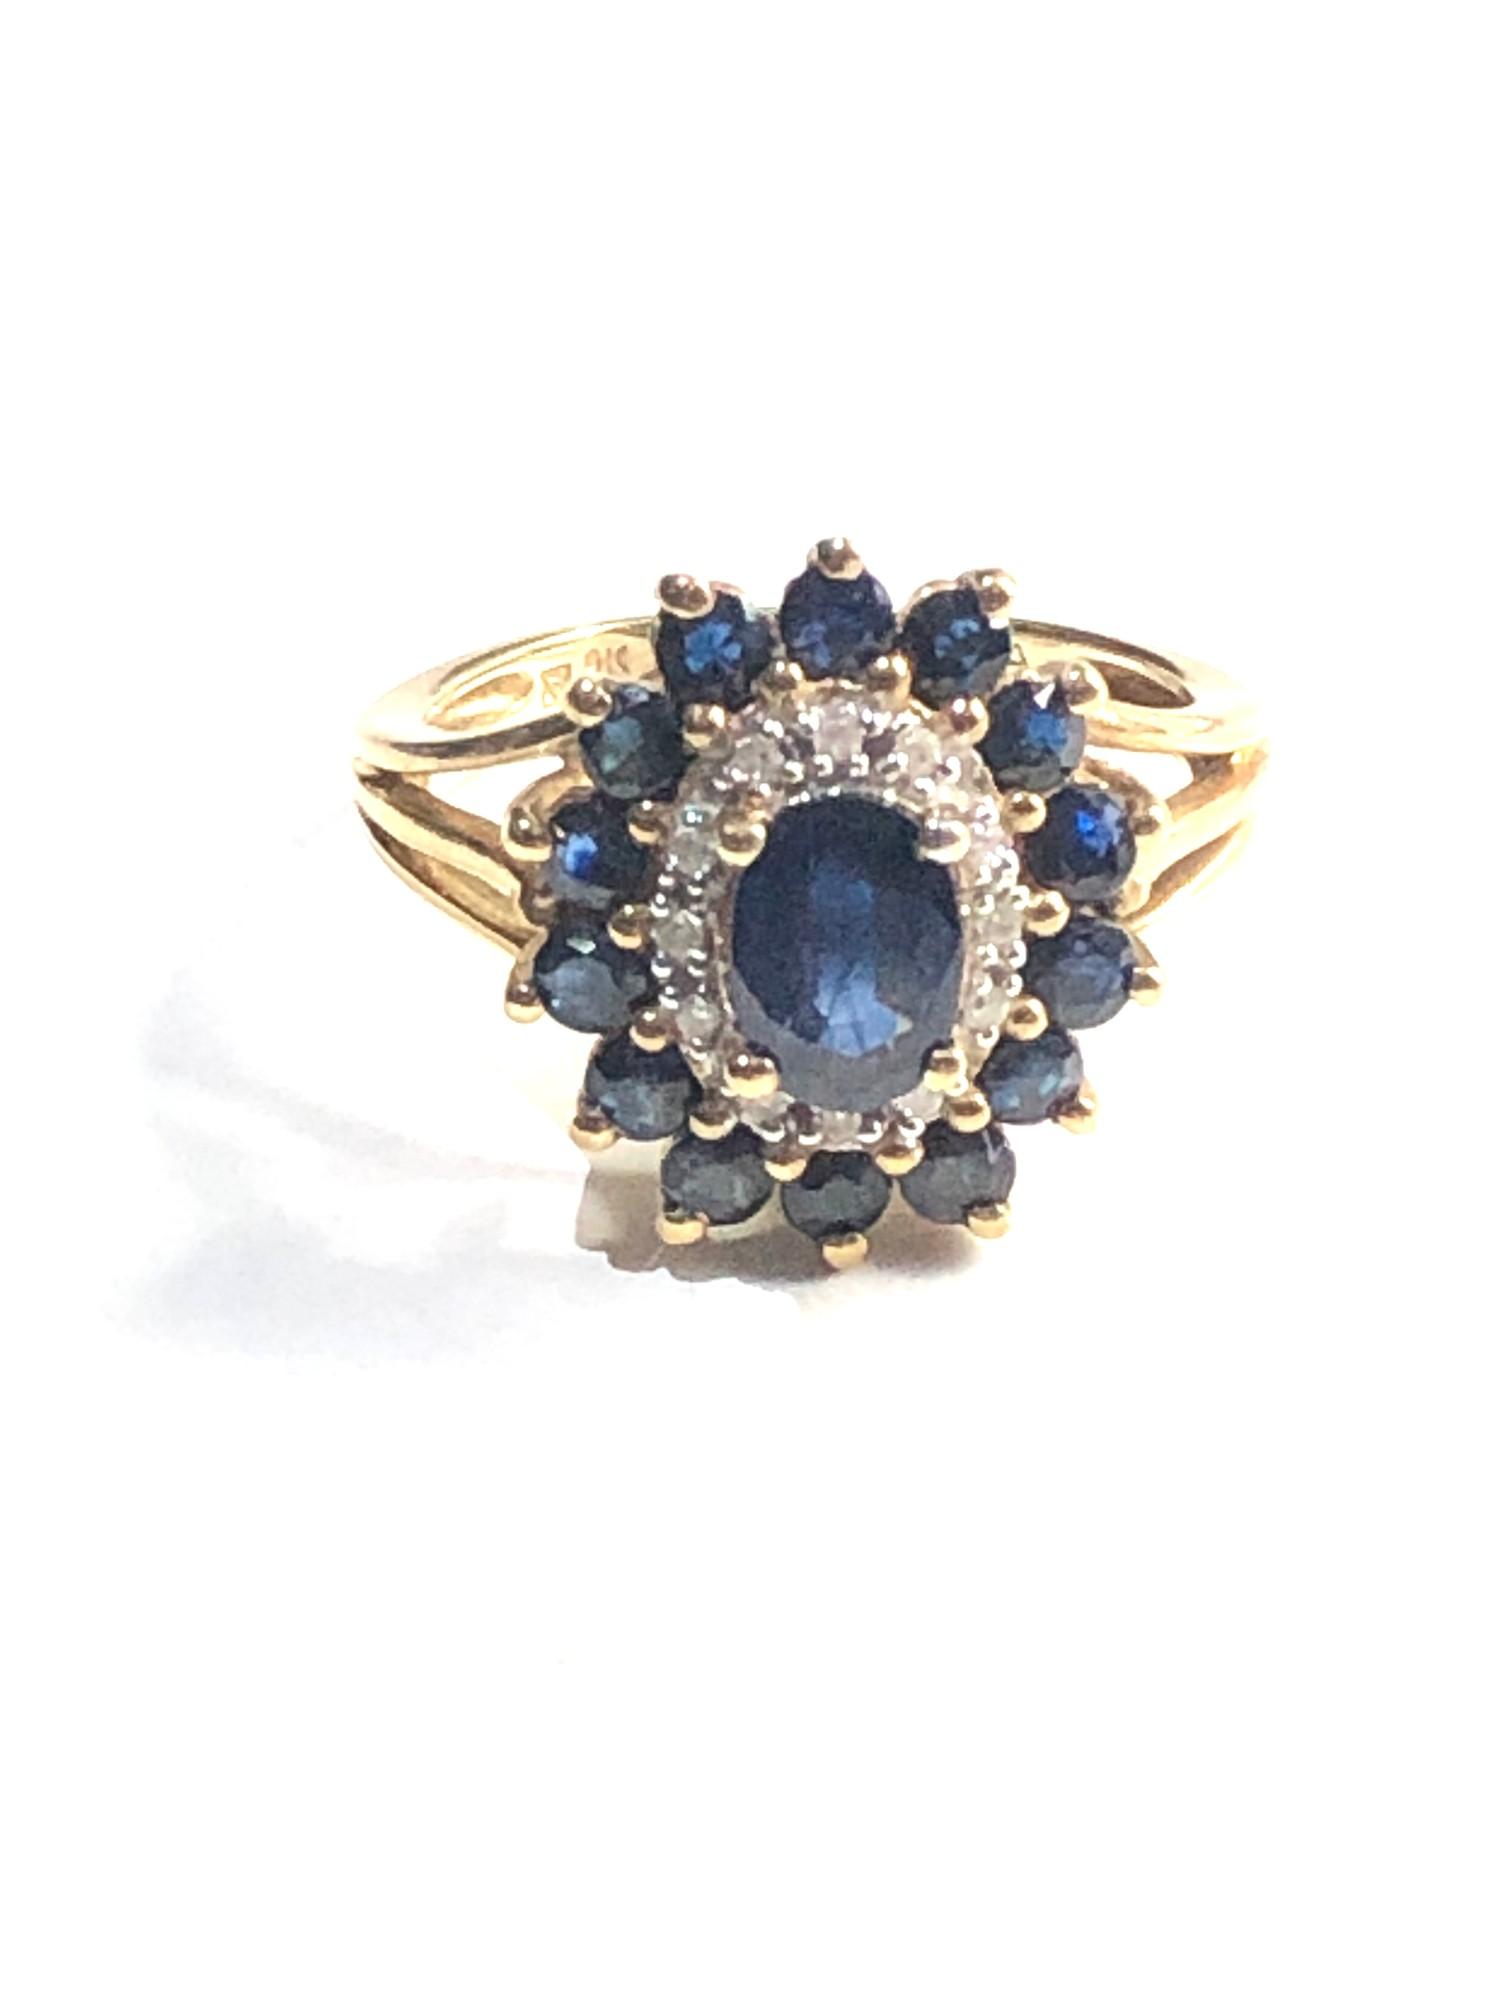 9ct sapphire & diamond cluster ring 3.9g